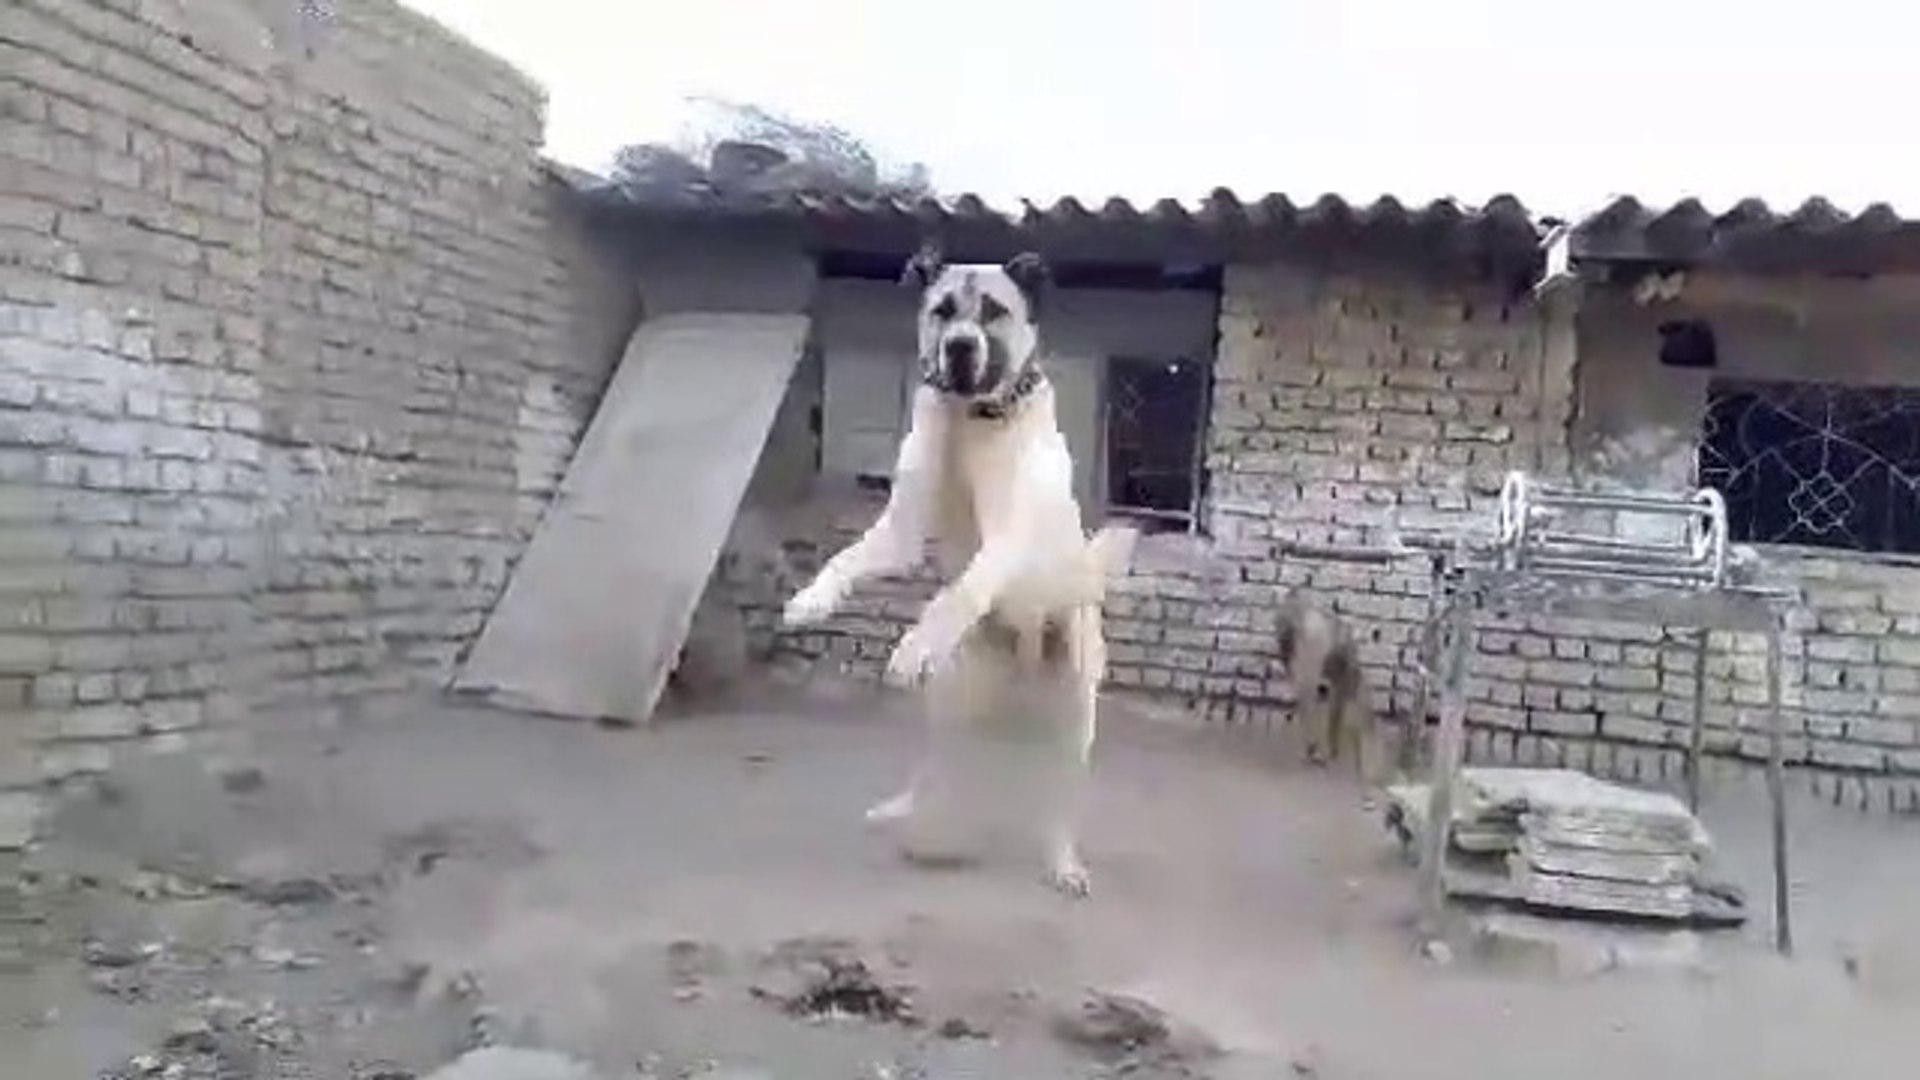 ADAMCI AFGAN COBAN KOPEGi - ANGRY AFGHAN SHEPHERD DOG